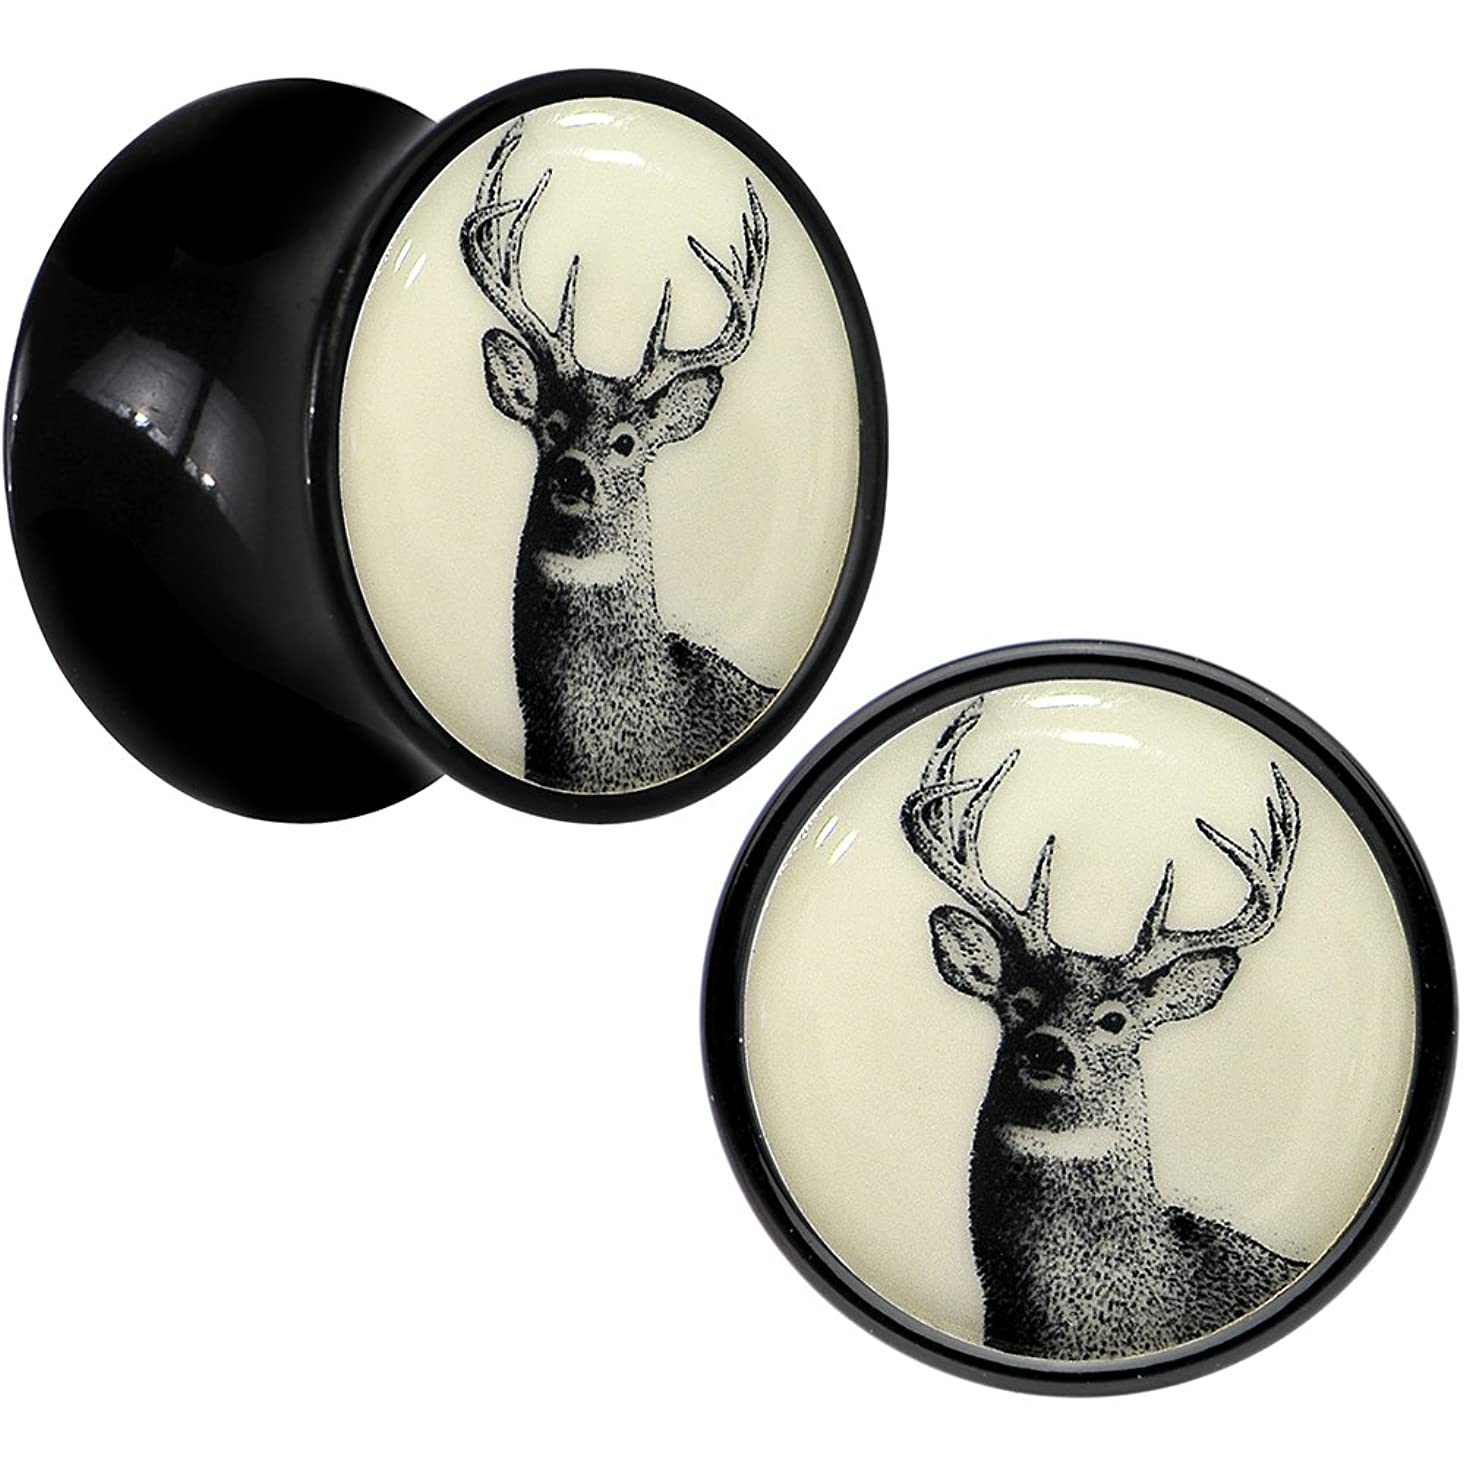 Body Candy Black Acrylic Buck Deer Glow in The Dark Saddle Ear Gauge Plug Pair 13mm